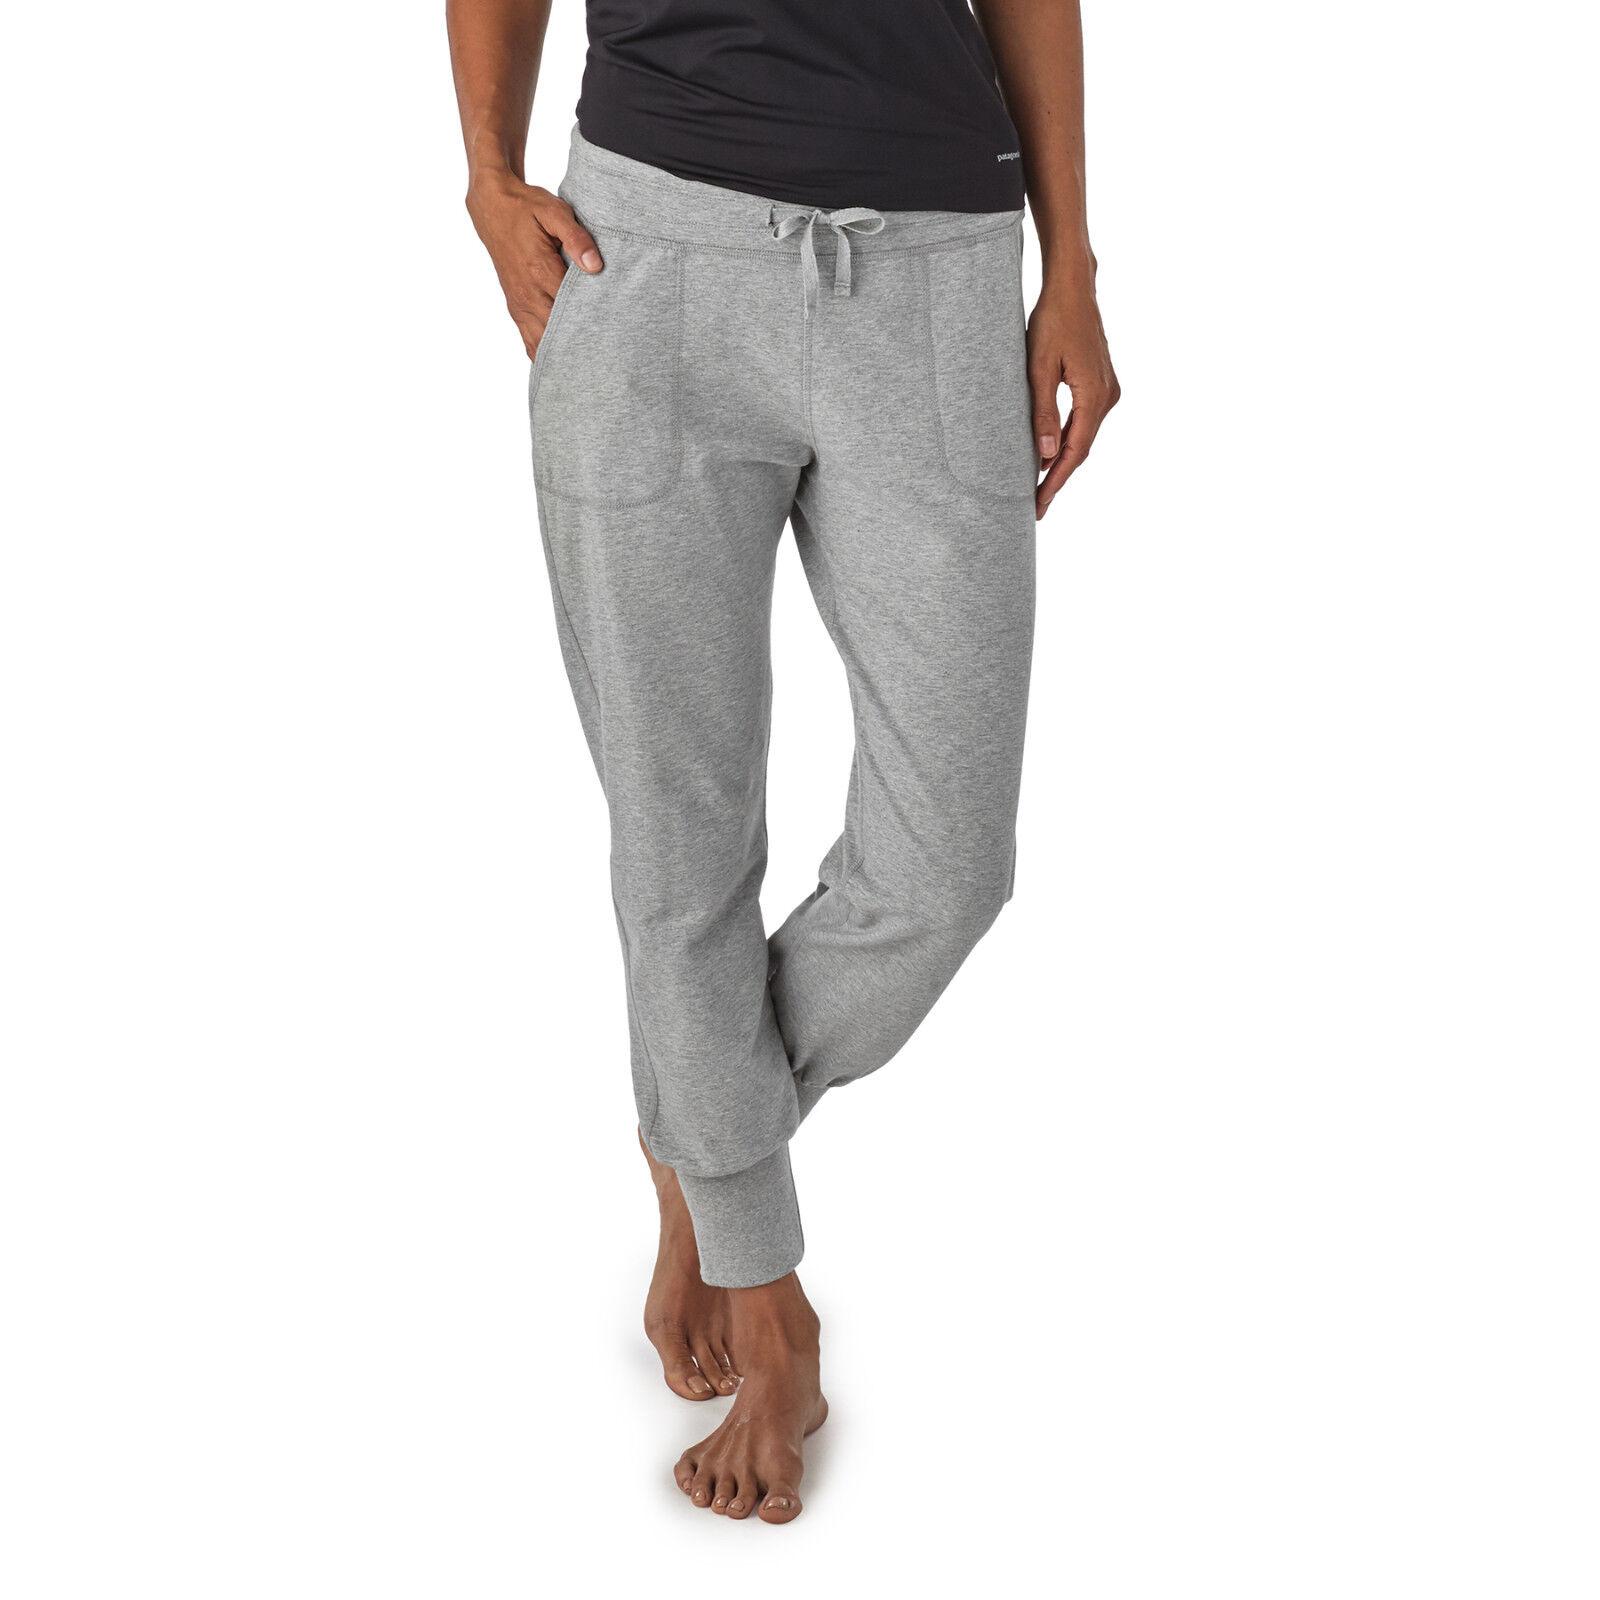 Patagonia Women's Ahnya Pants - Jersey Hose Yoga Fitness Freizeit Bio Baumwolle